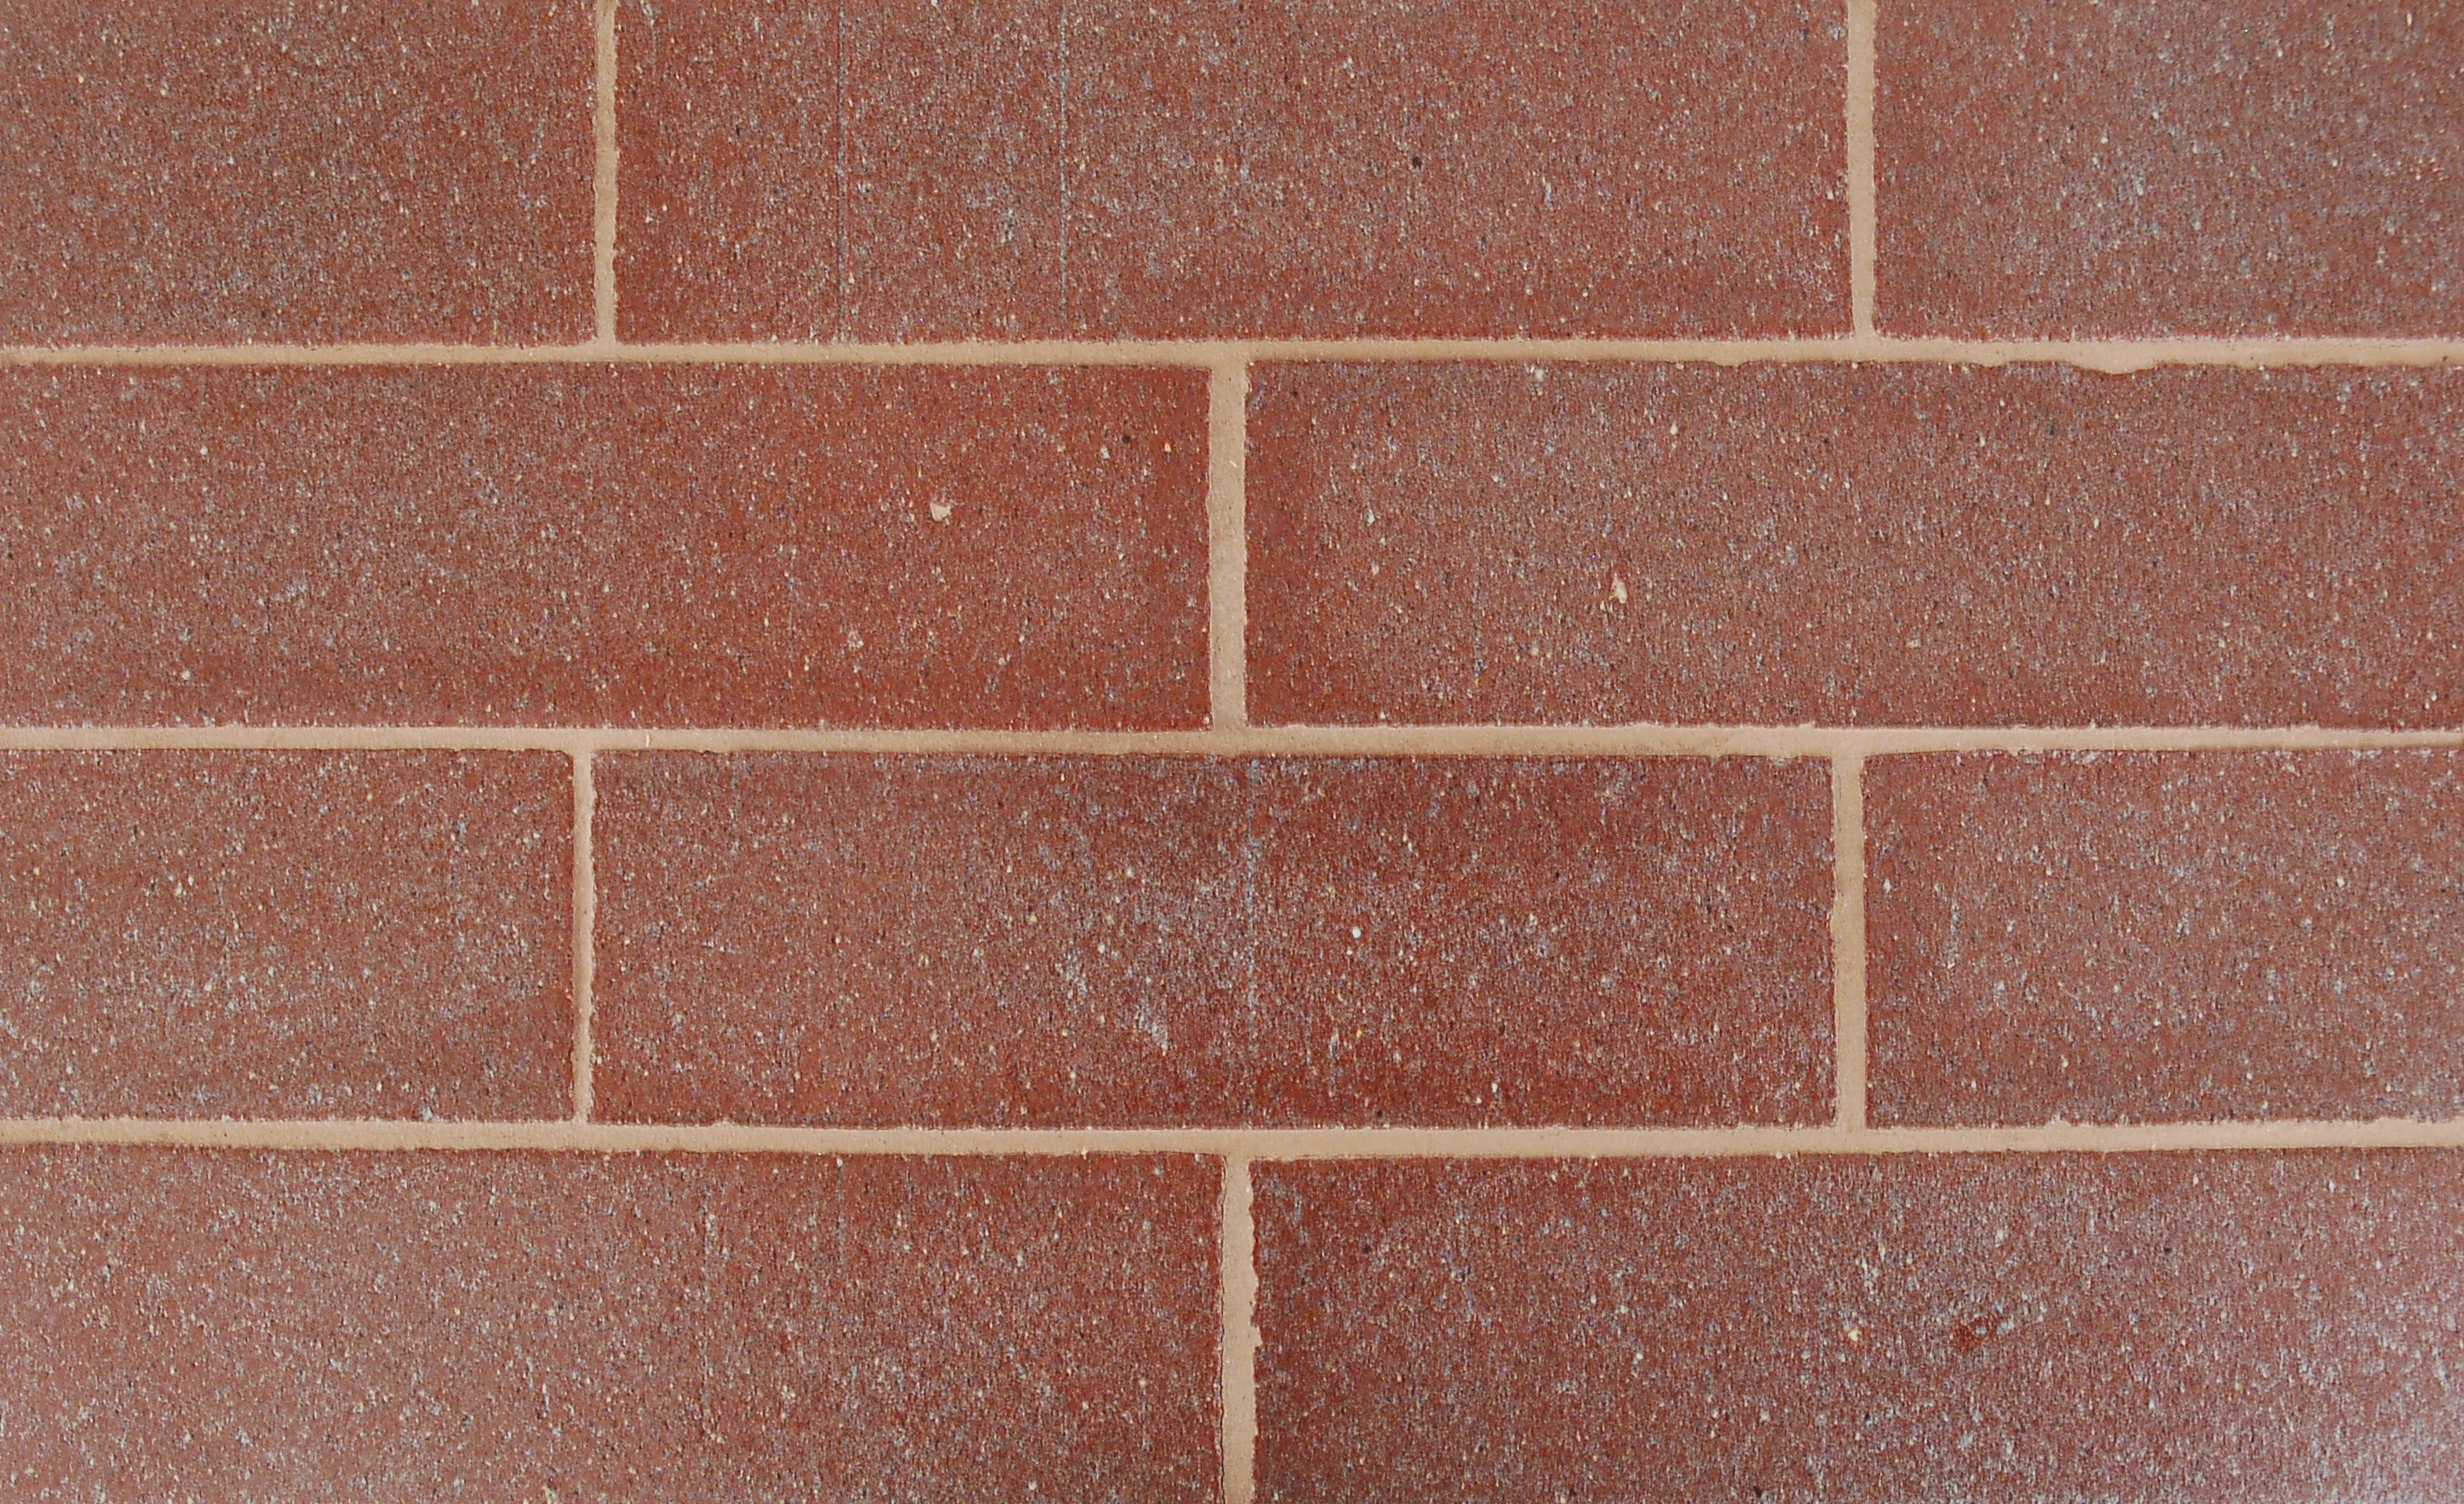 Fire Clay Tile : Fireclay tile glazed thin brick